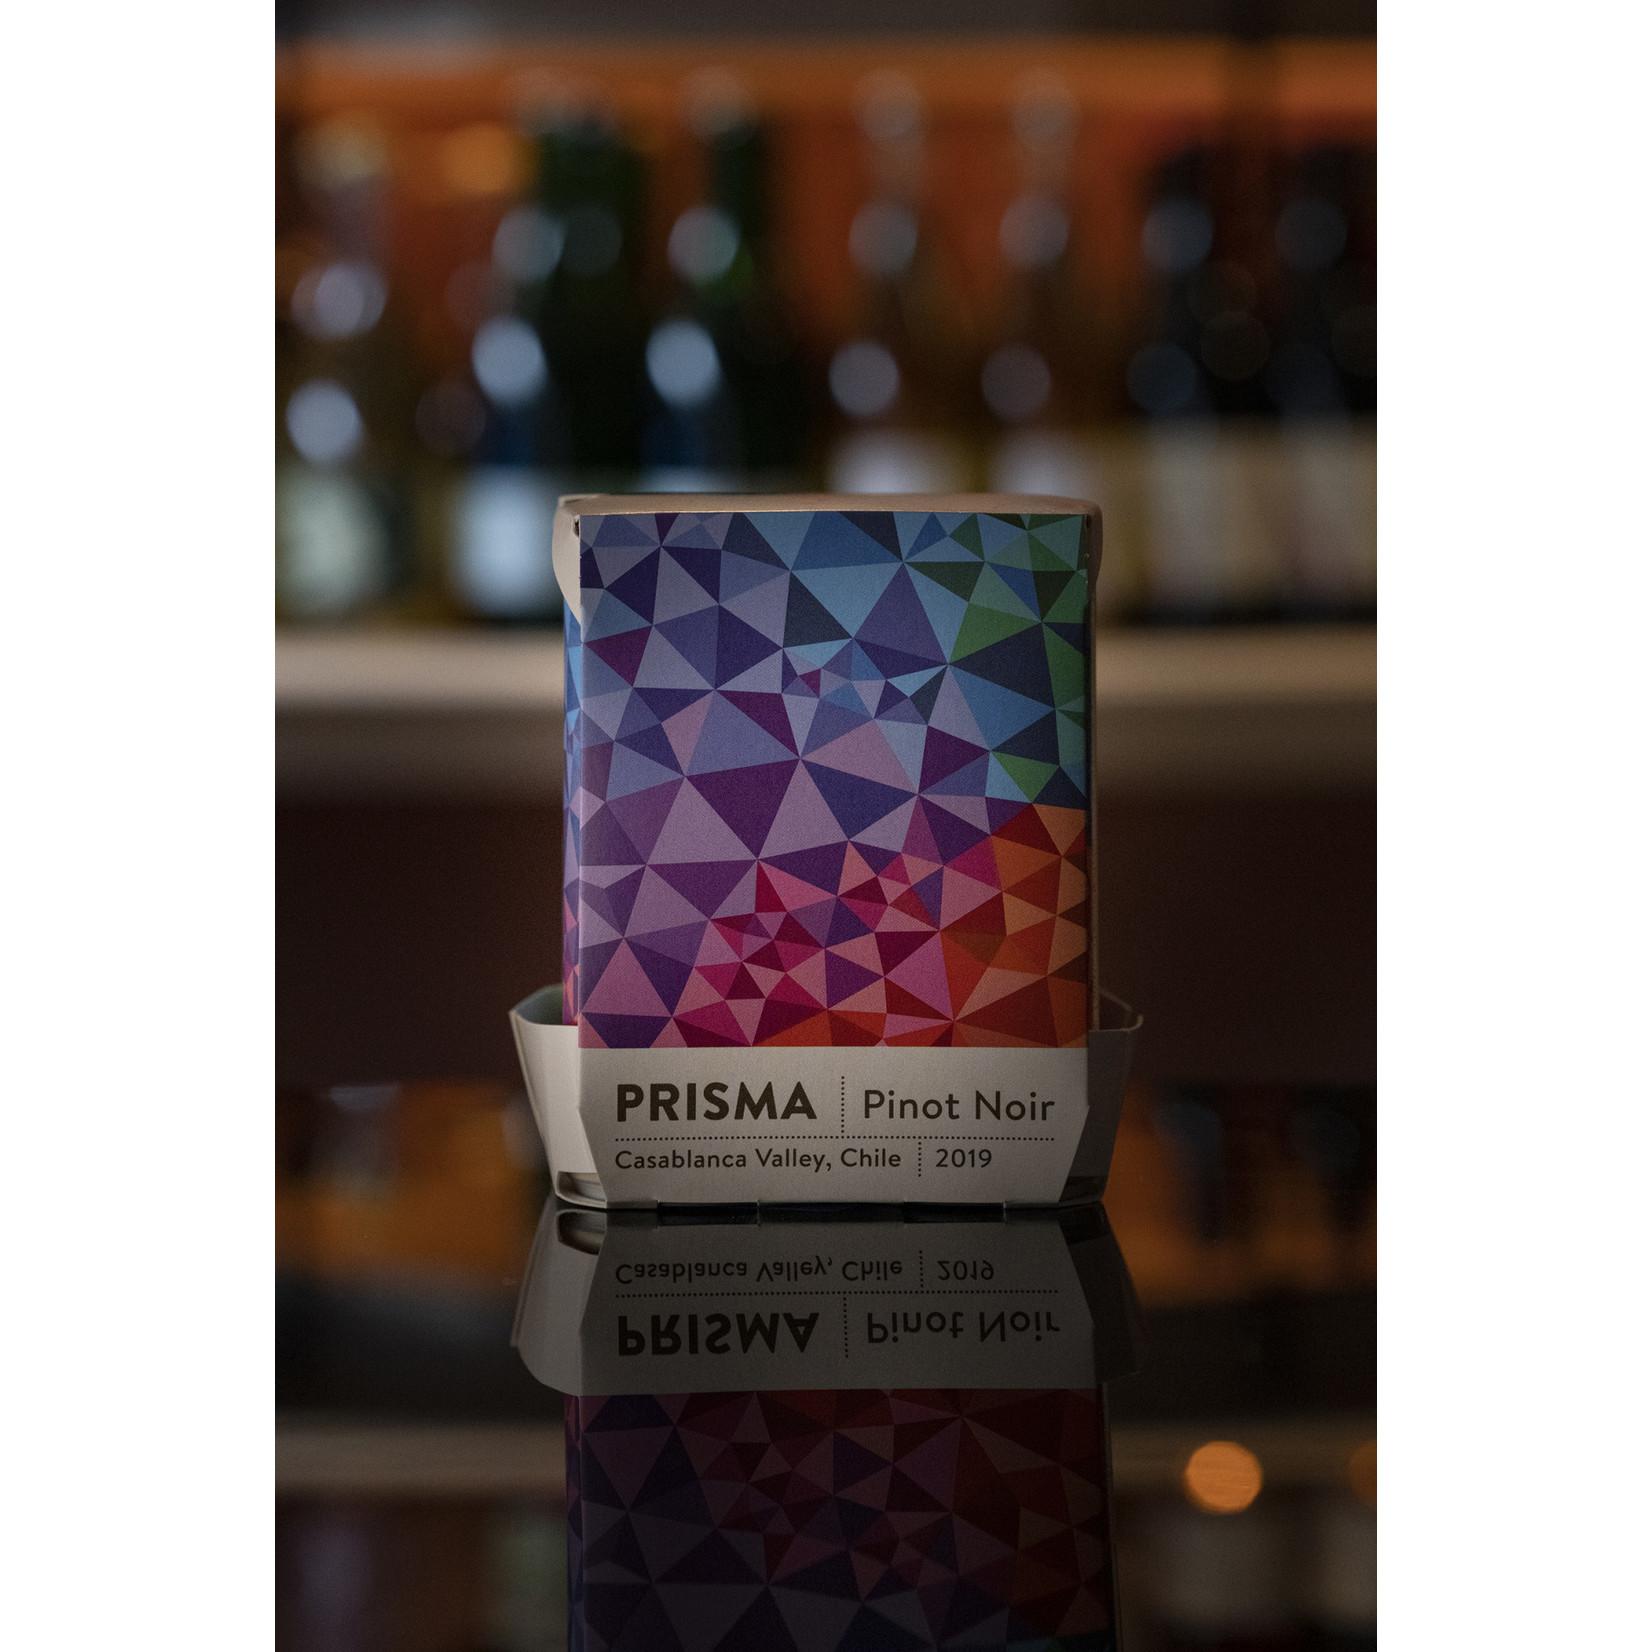 Prisma Pinot Noir 4-Pack